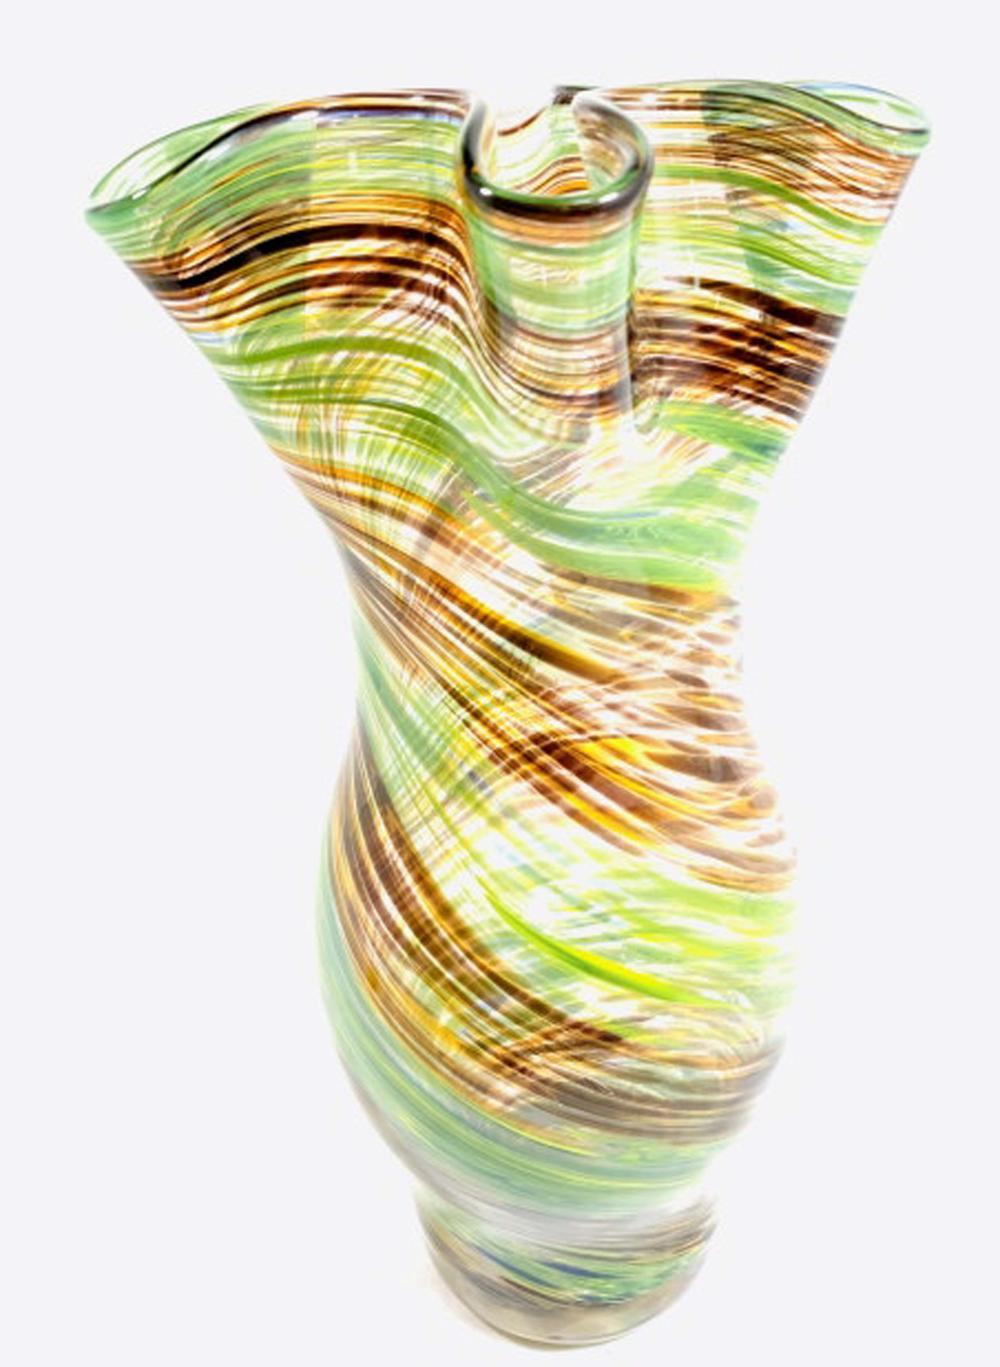 ELEGANT RUFFLE TOP GREEN/BROWL SWIRL ART GLASS VASE